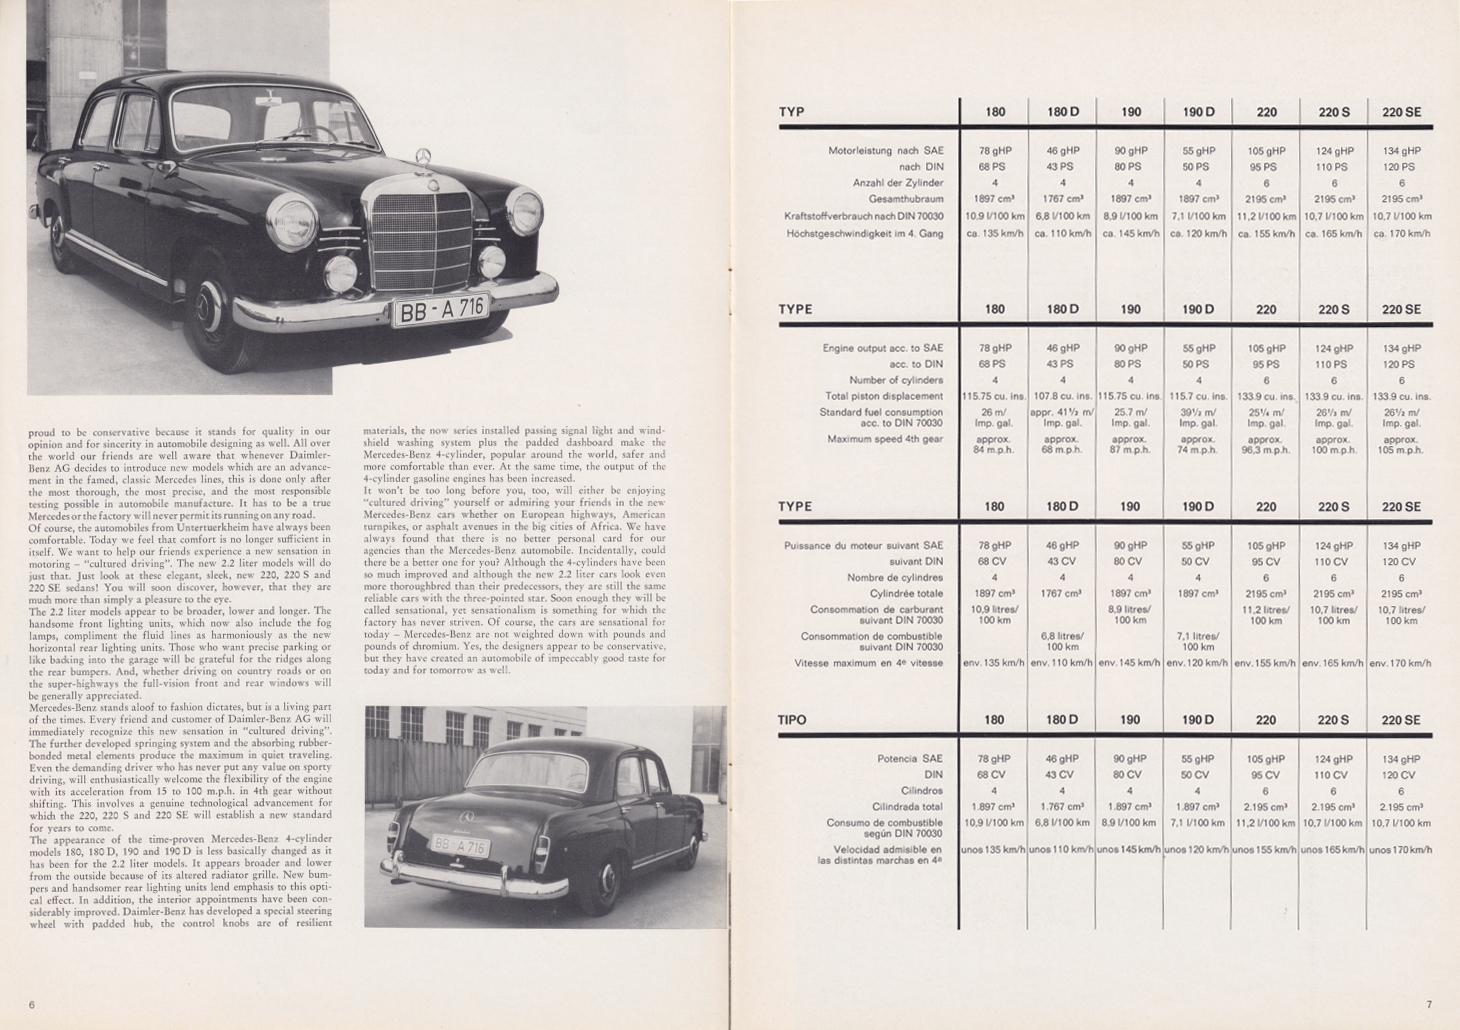 (REVISTA): Periódico In aller welt n.º 34 - Mercedes-Benz no mundo - 1959 - multilingue 004